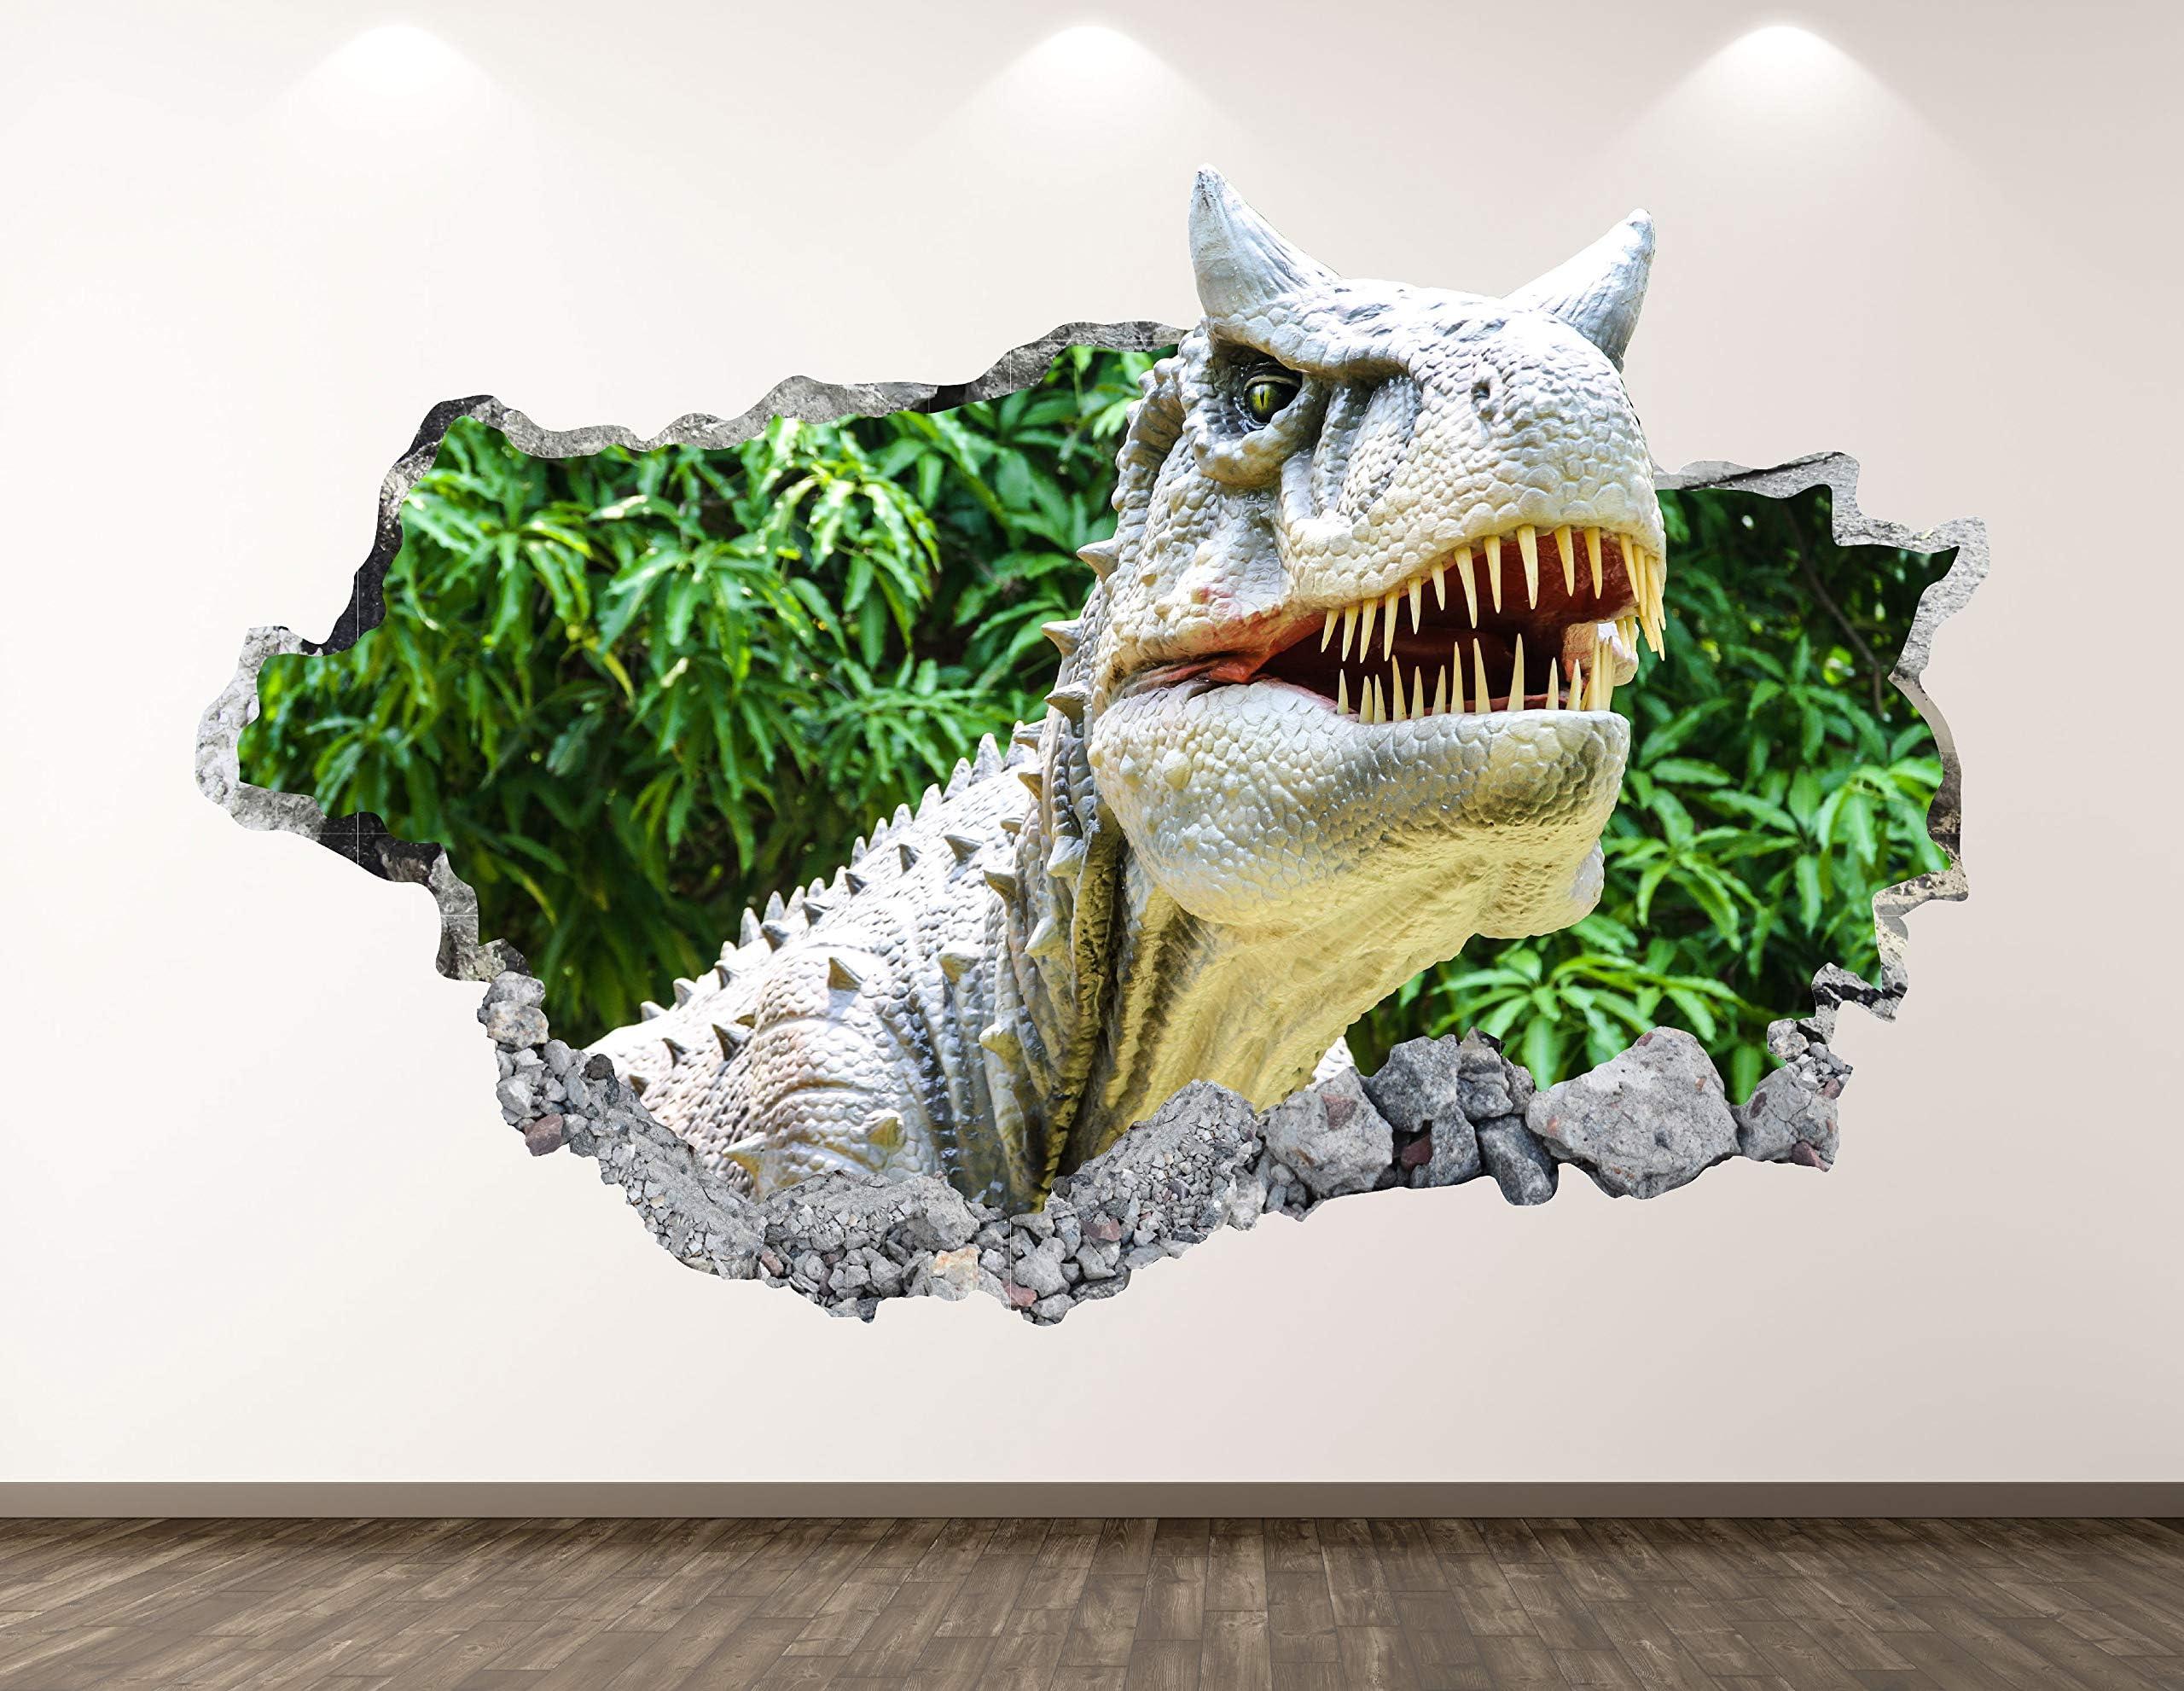 Wild Tyrannosaurus 3D Smashed Wall Decor Art Sticker Kids Vinyl Poster Mural Personalized Gift BL380 Dinosaur Wall Decal